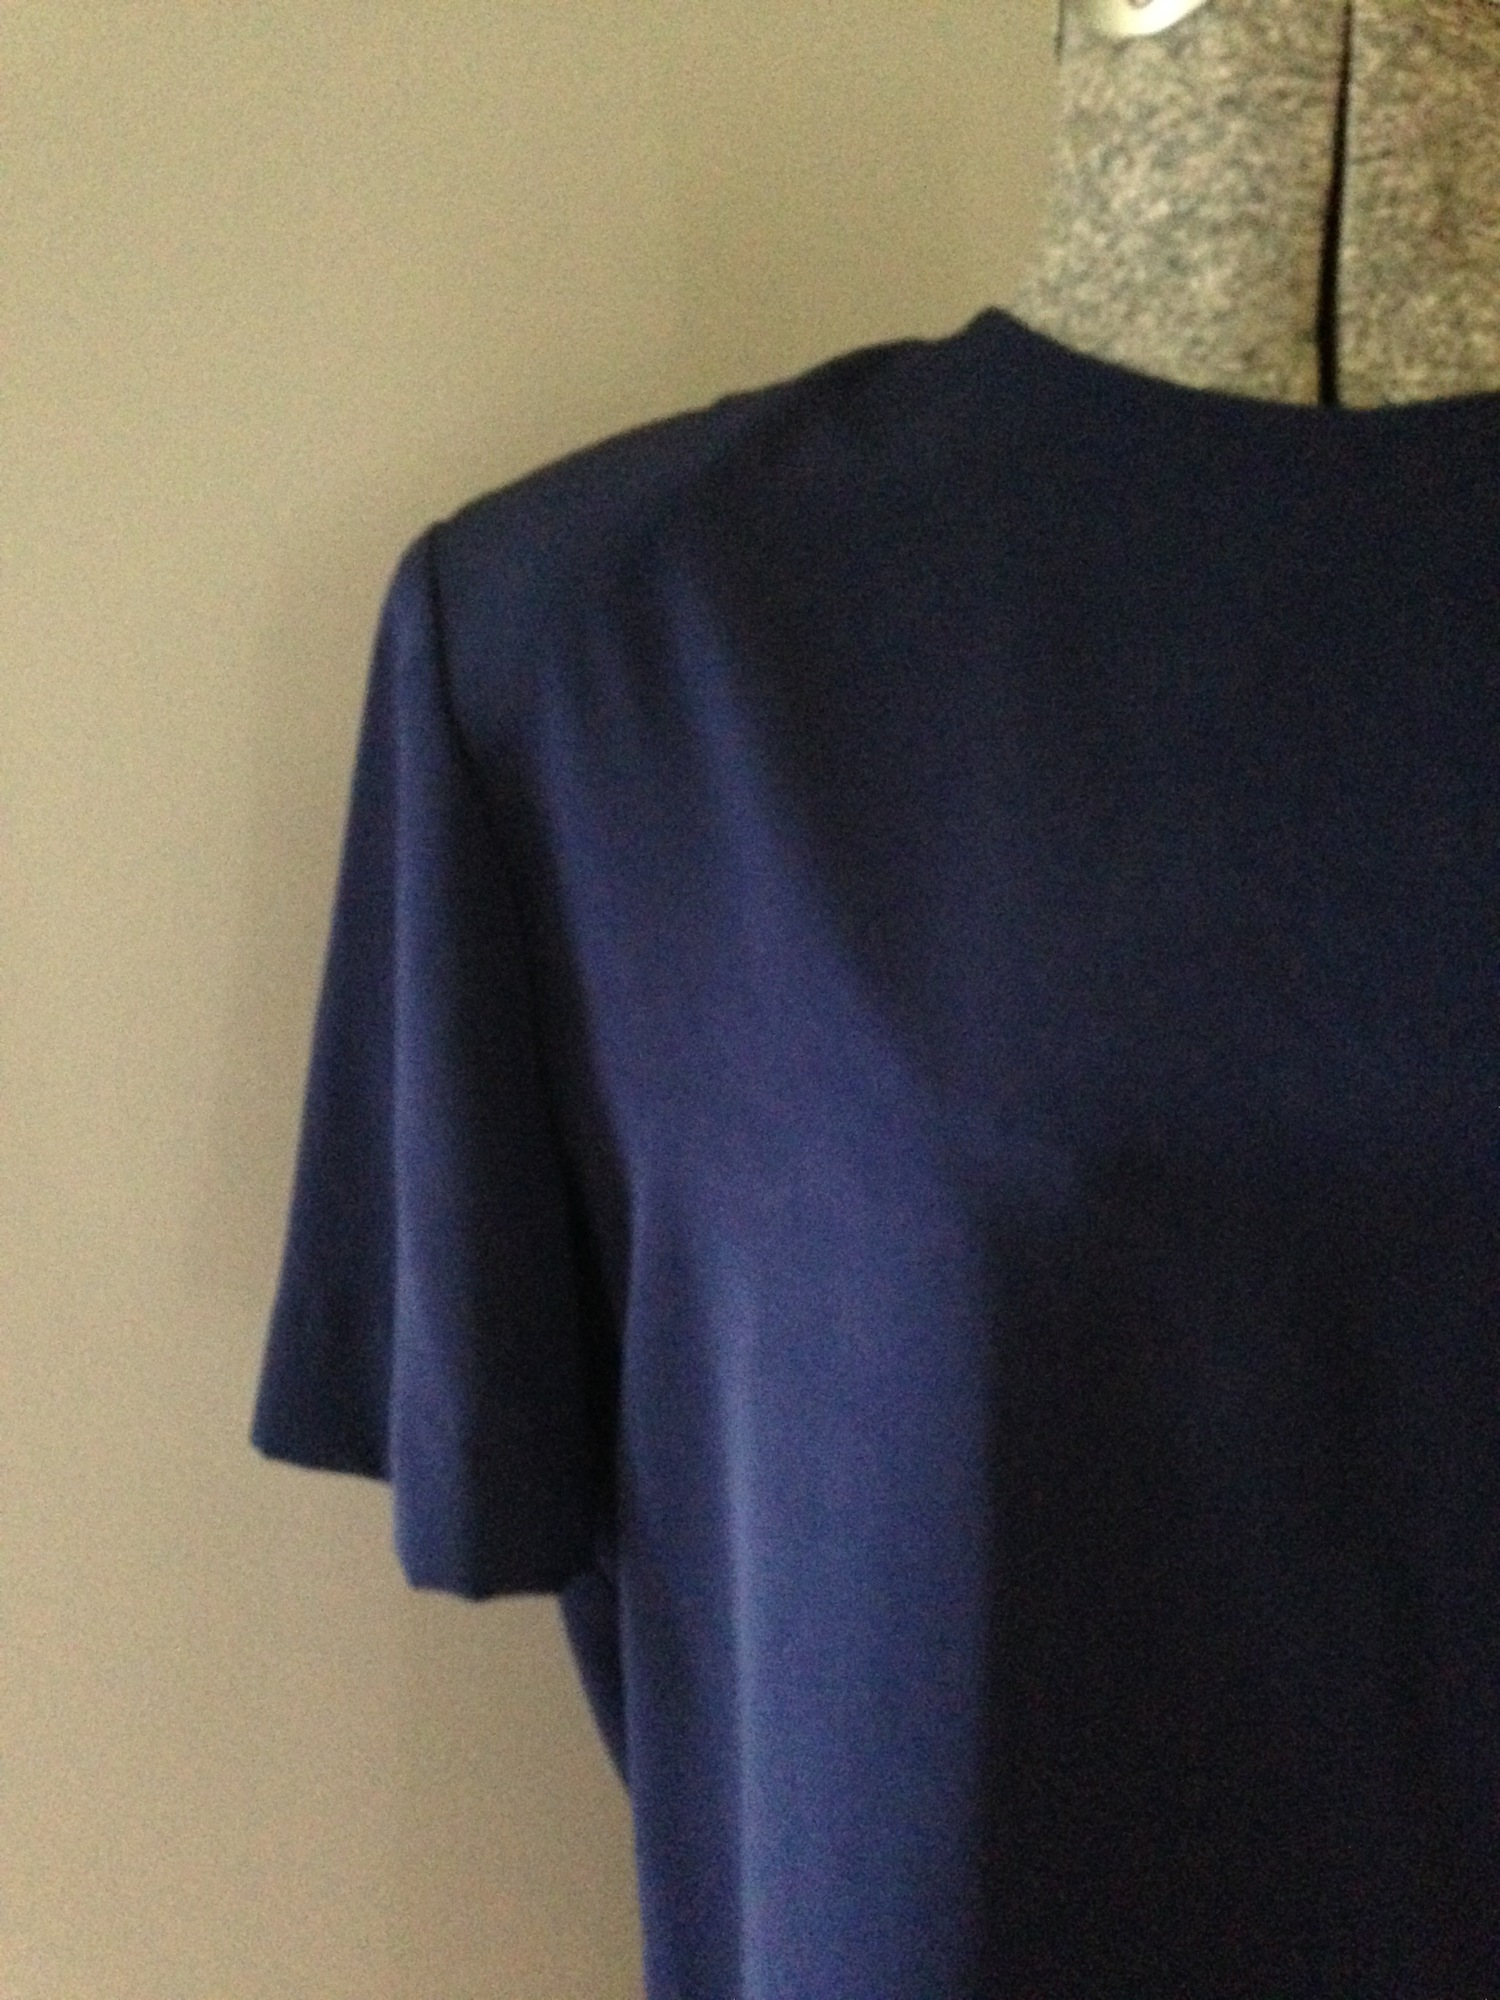 vintage navy blue silk blouse $26 - tops - bright lights big pretty